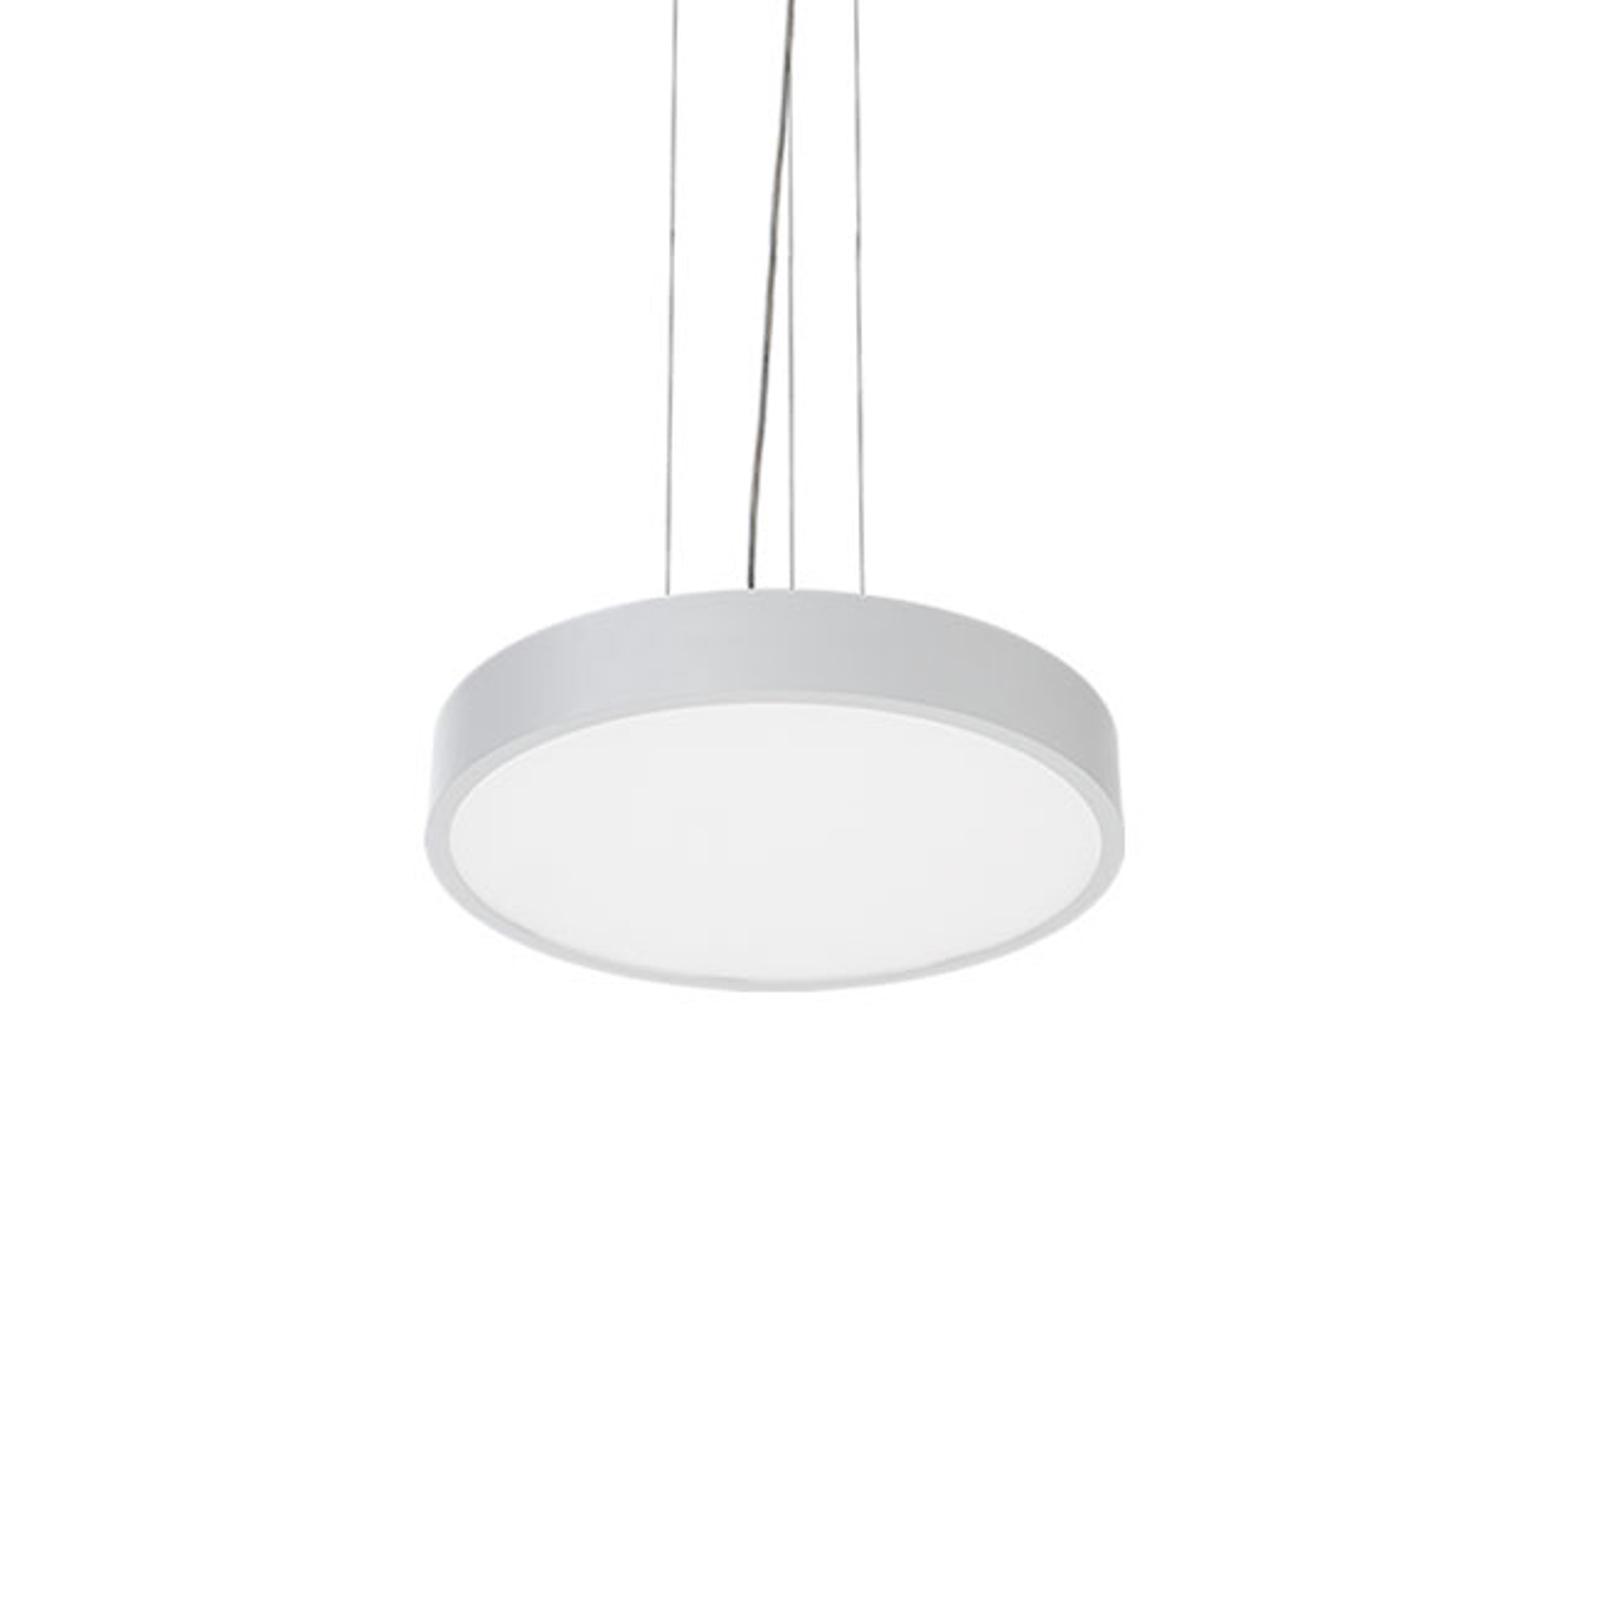 LED hanglamp C90-P, Ø 57 cm, 3.000 K, wit